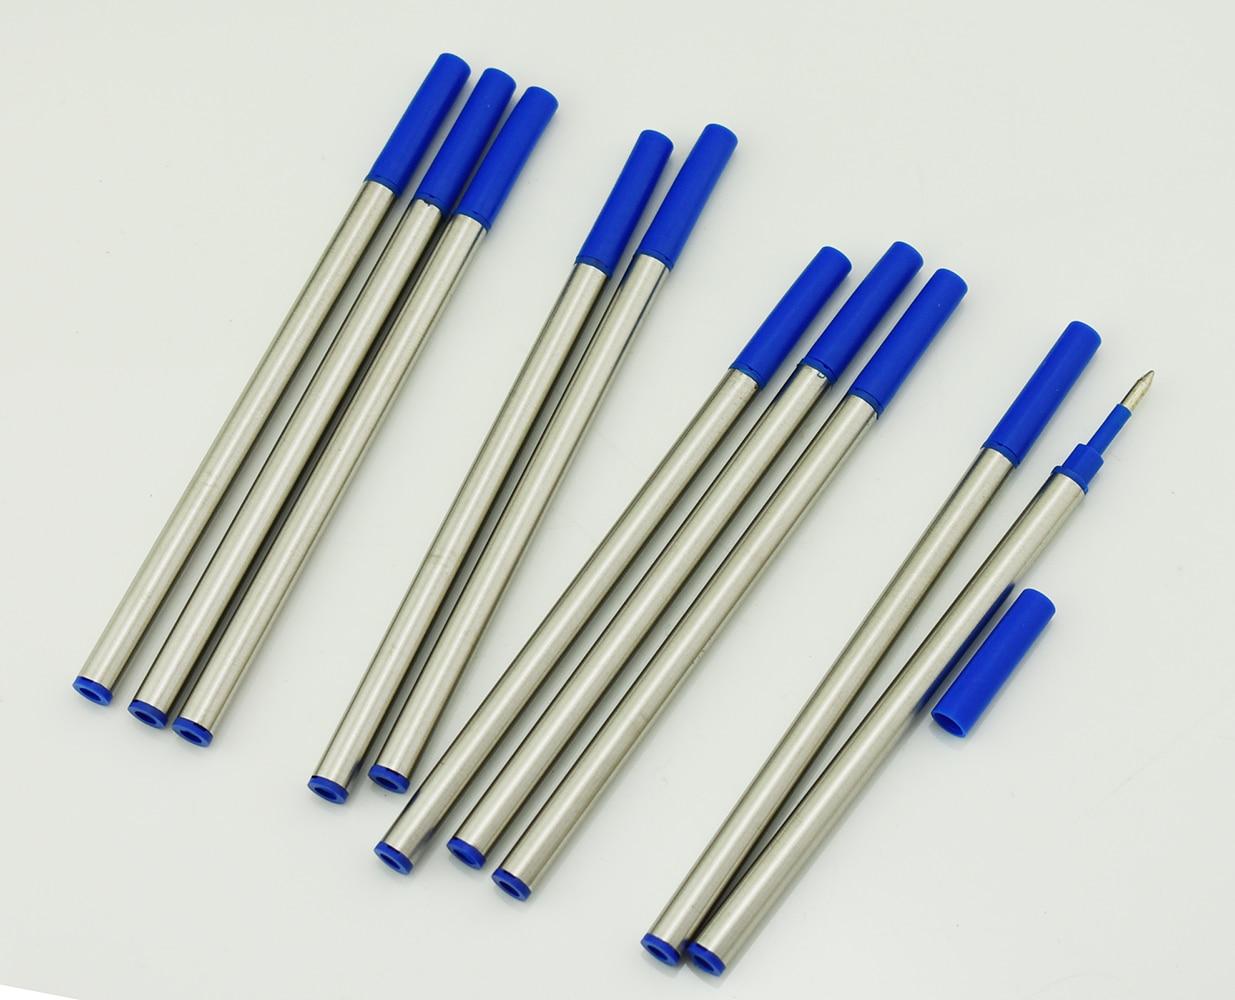 10 Pieces Baoer Rollerball Pen Ink Refills for BAOER,FULIWEN,JINHAO,DUKE Rollerball Pens , Push Type 0.5 mm - Blue Color10 Pieces Baoer Rollerball Pen Ink Refills for BAOER,FULIWEN,JINHAO,DUKE Rollerball Pens , Push Type 0.5 mm - Blue Color